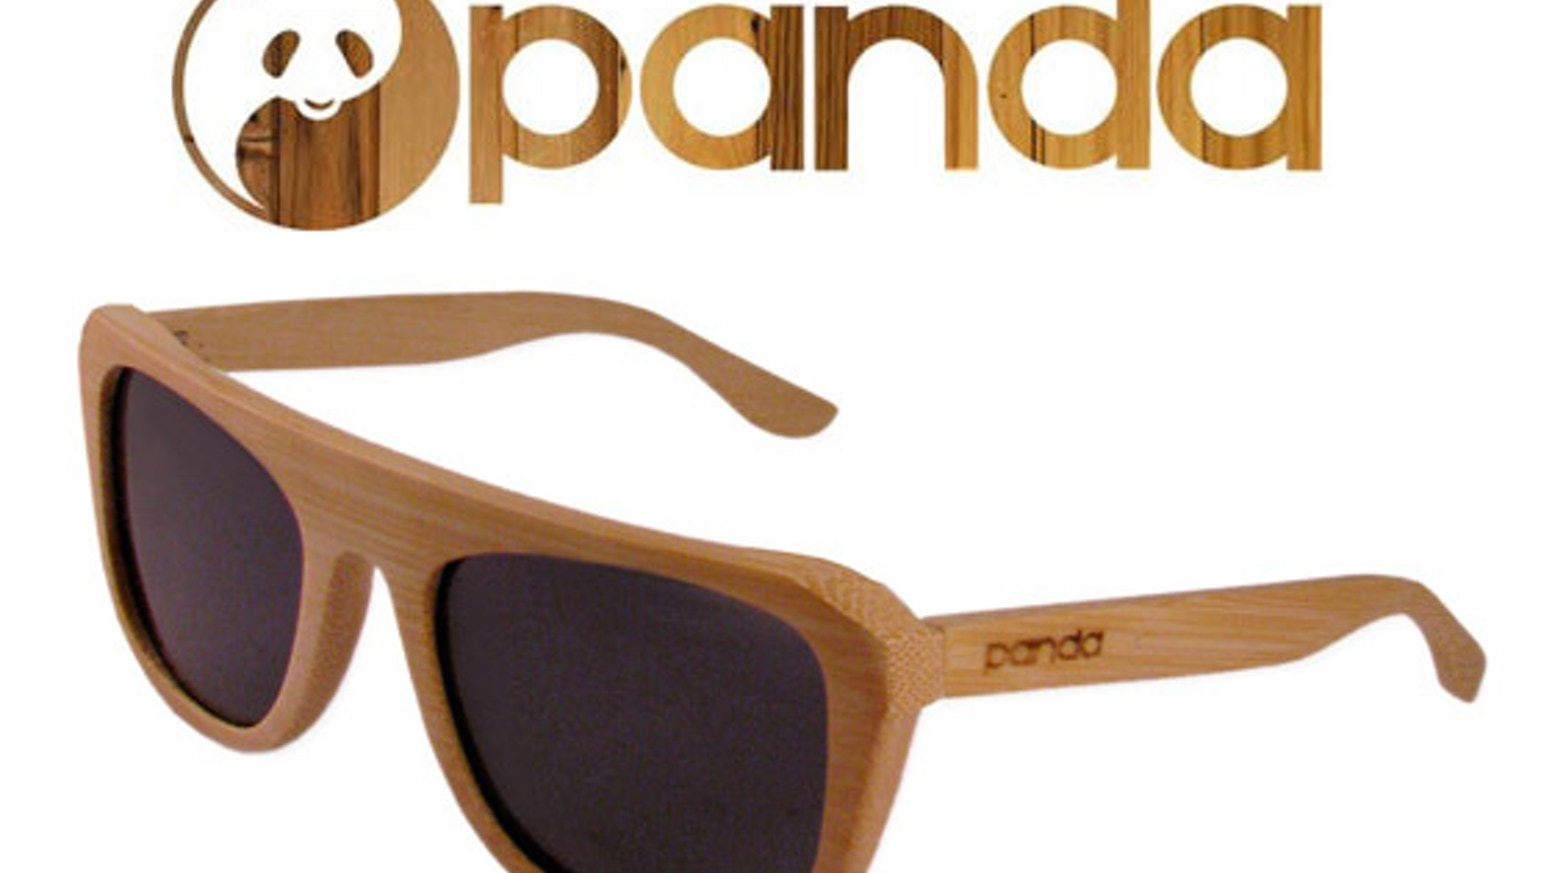 561de2d596ba1 PANDA  Eco-friendly Handmade Bamboo Sunglasses by Vincent Ko ...